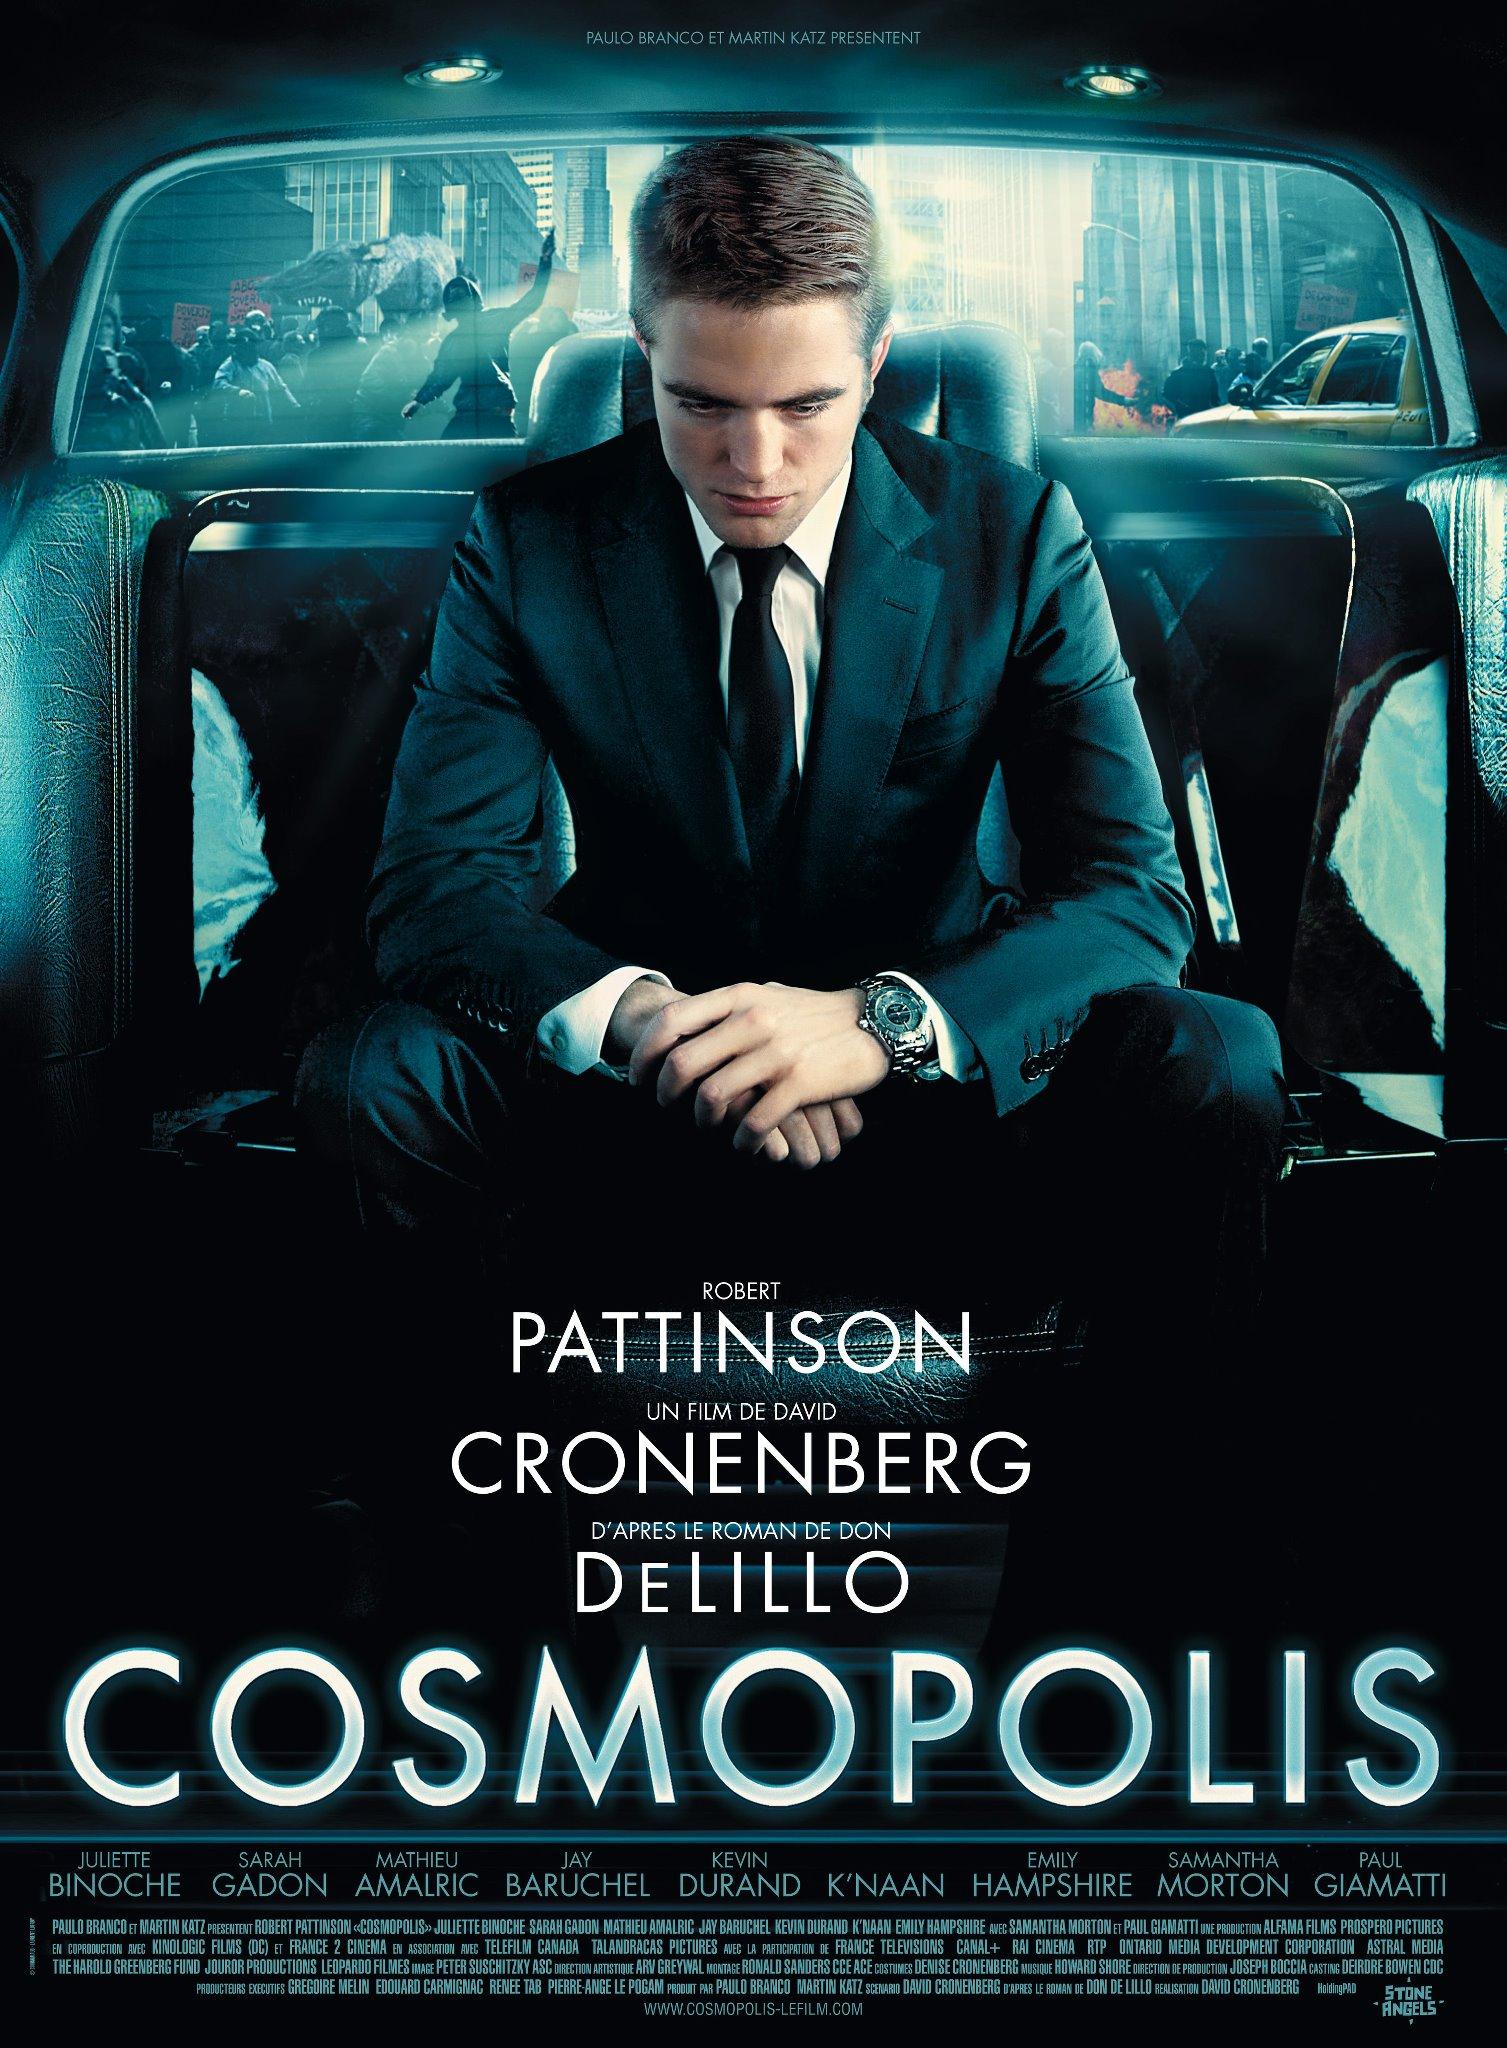 Teaser Trailer and Poster for Cosmopolis Starring Robert